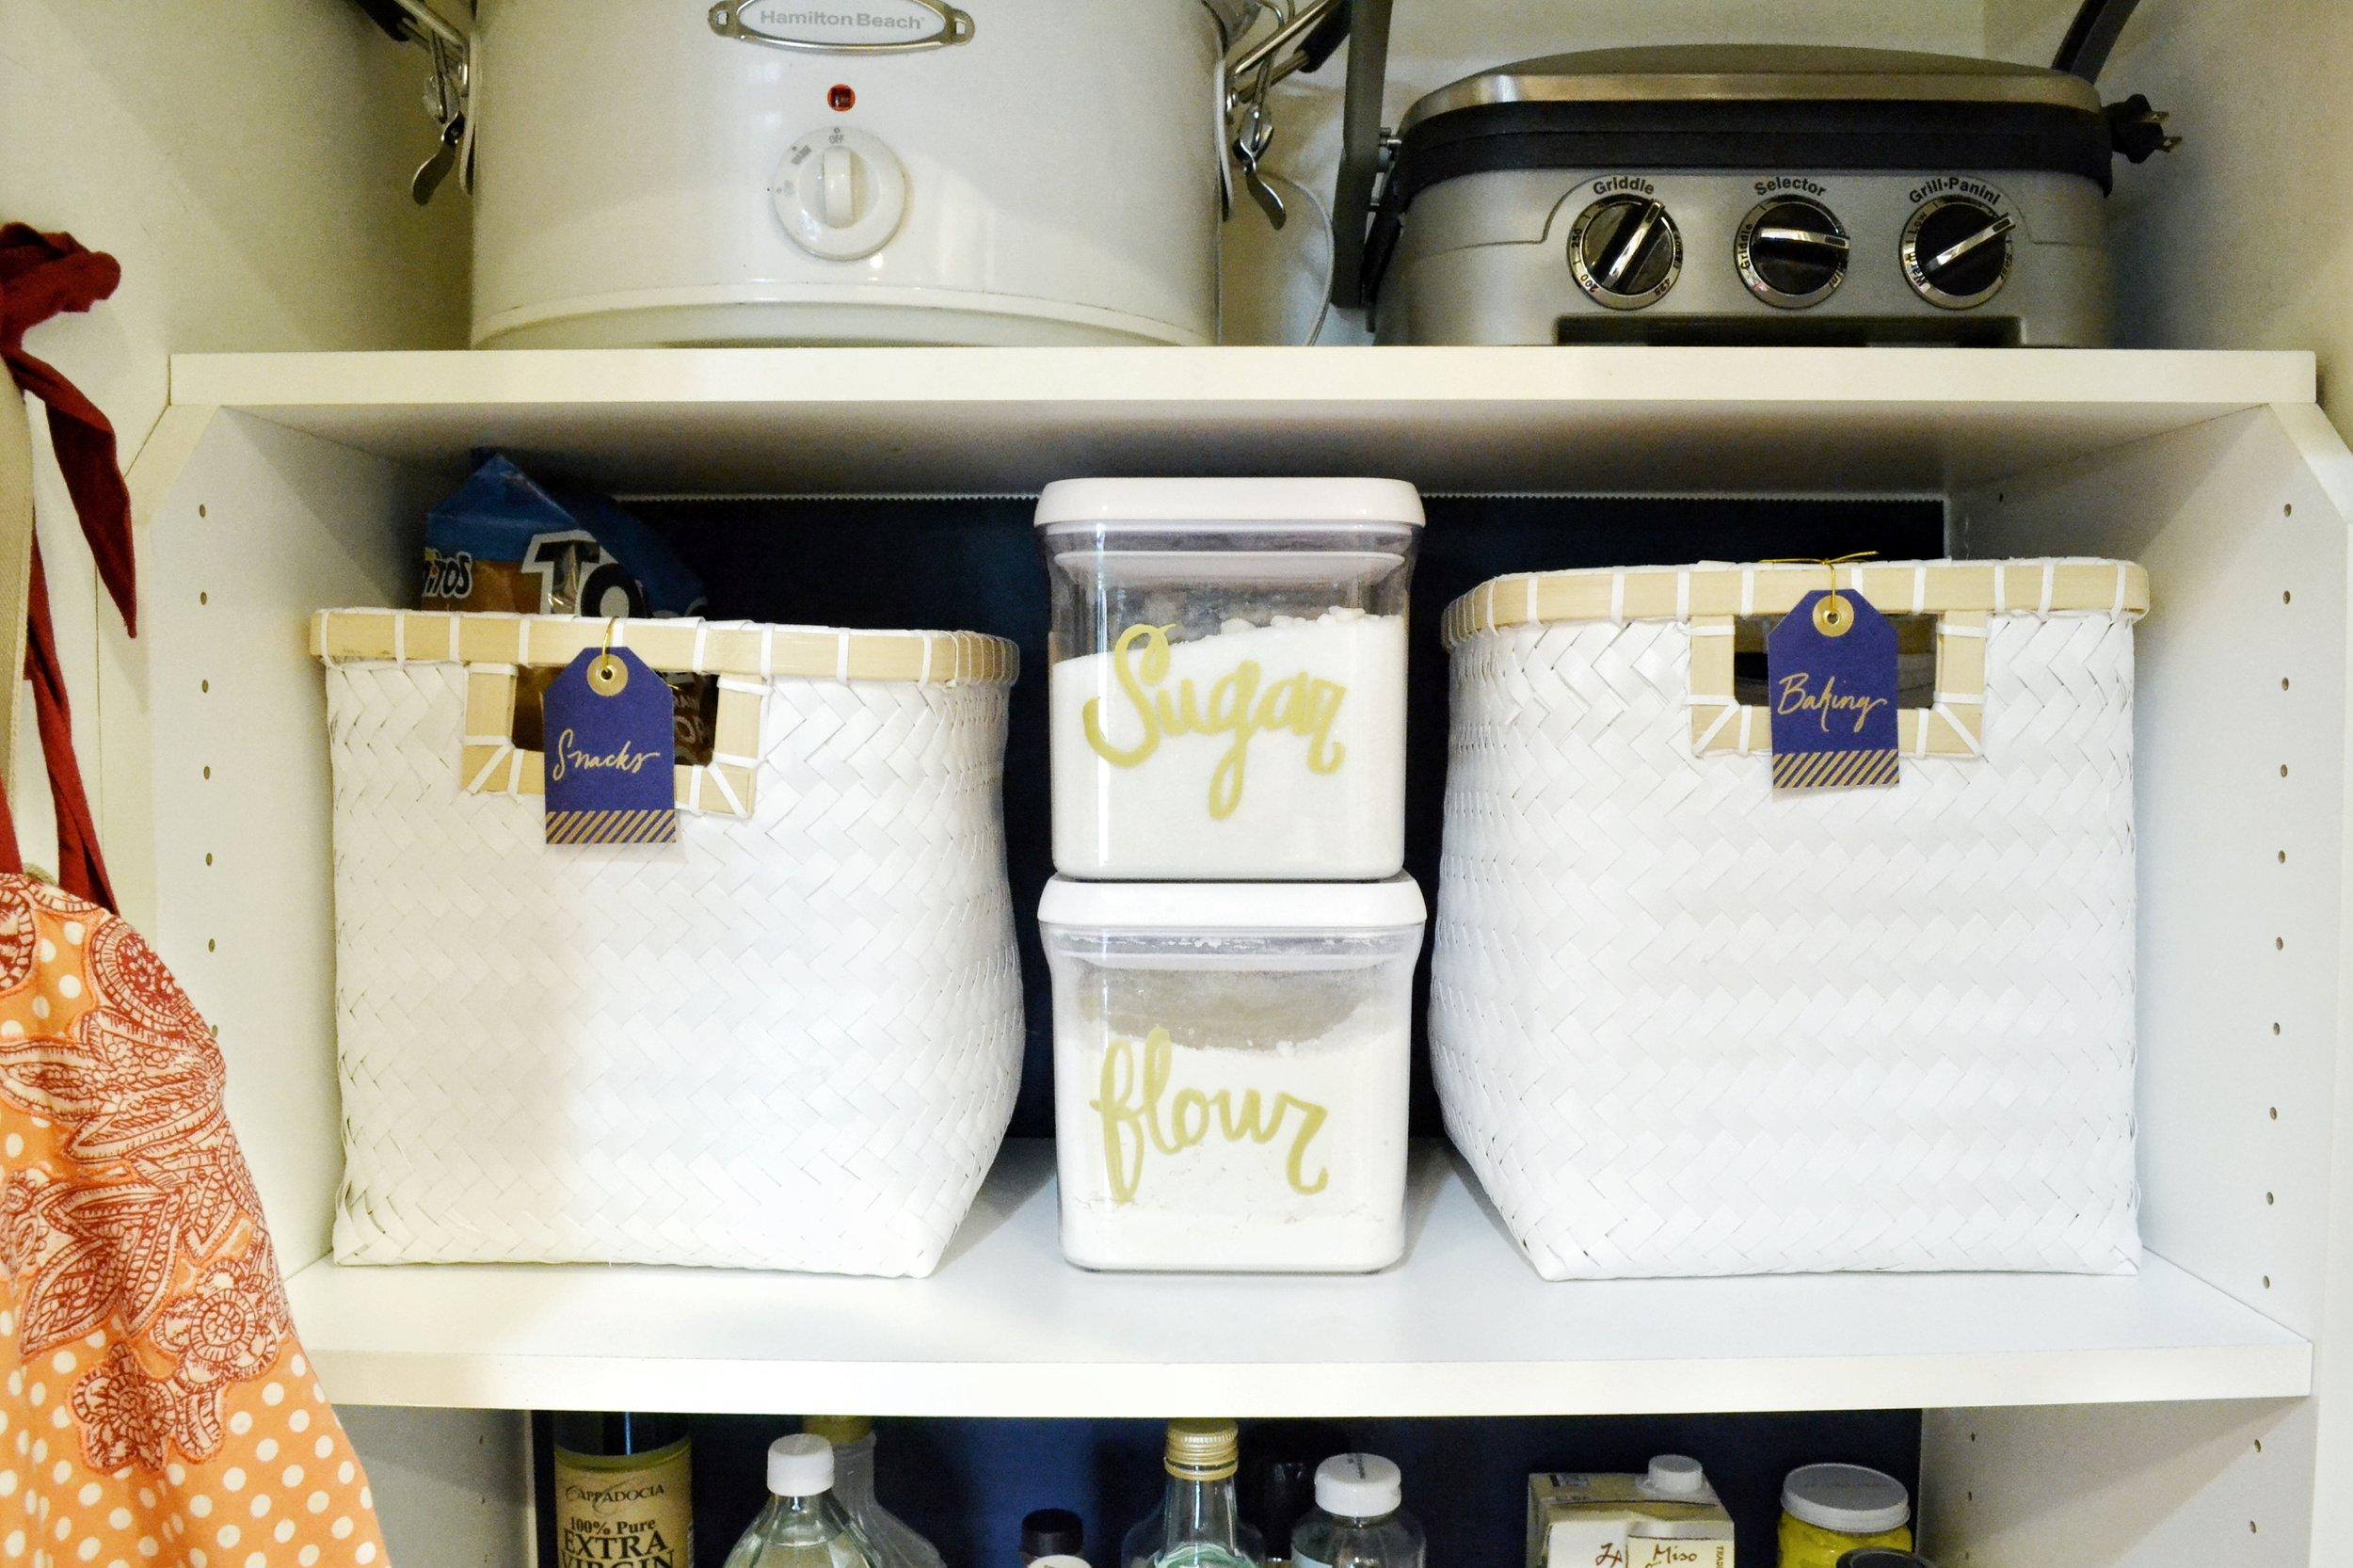 Organized Small Pantry | Image Courtesy of The Baer Minimalist